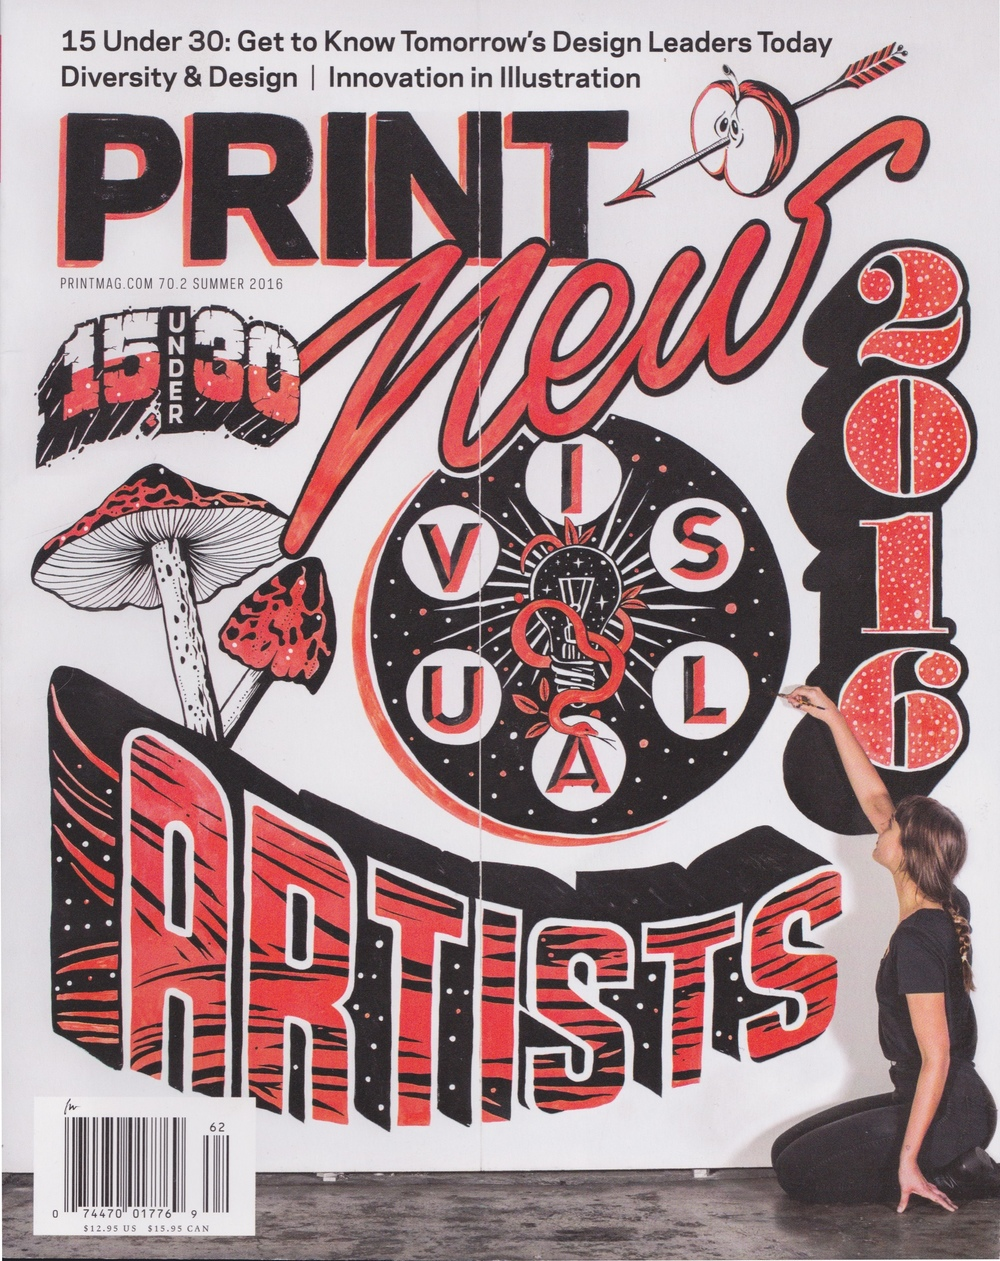 PrintMagazine-Cover.jpg